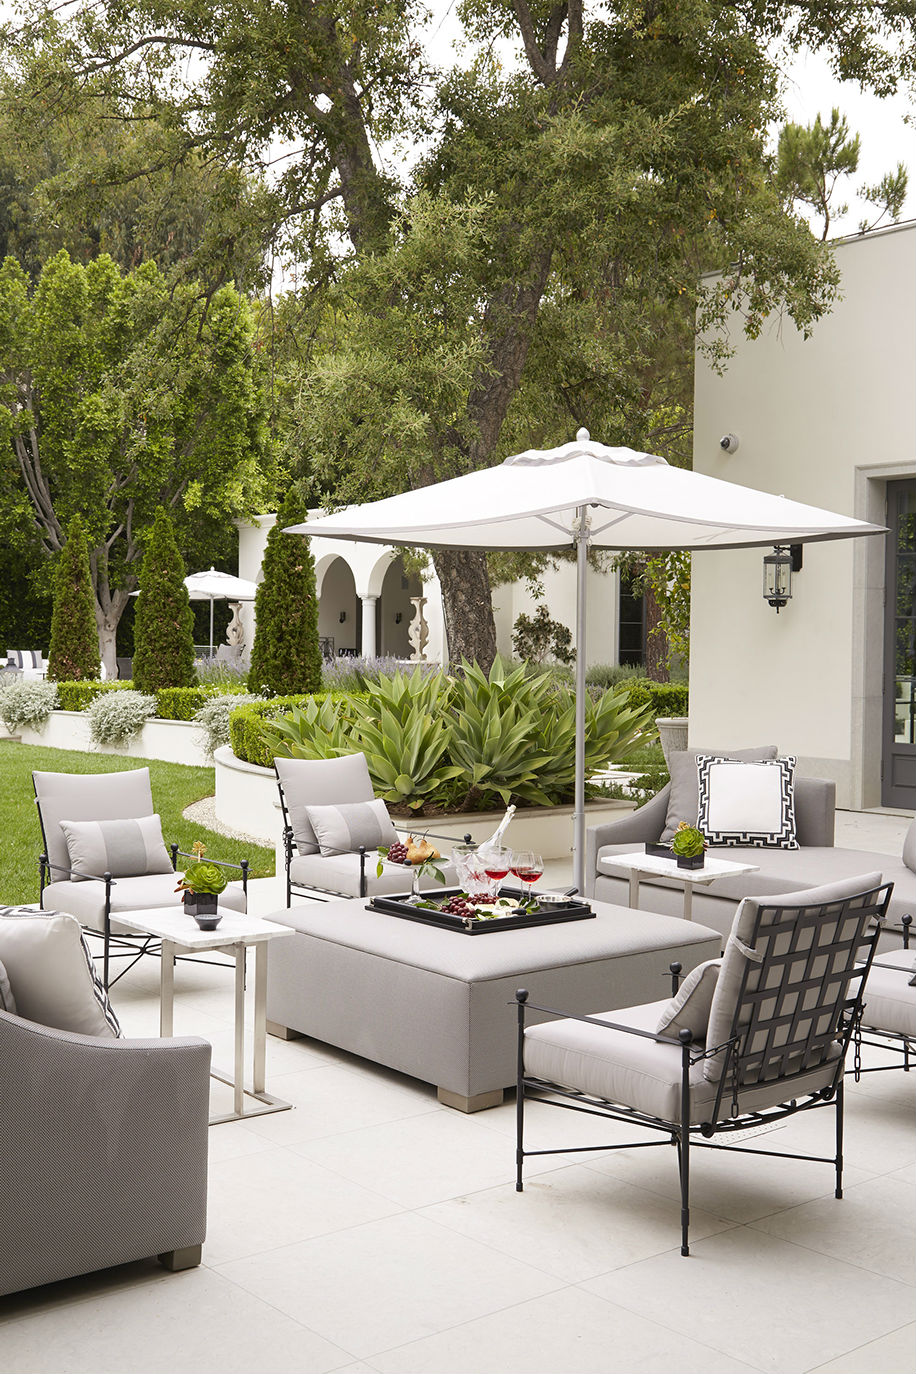 {Amalfi Living chairs, Giati fabric; Umbrella, Summit Furniture}